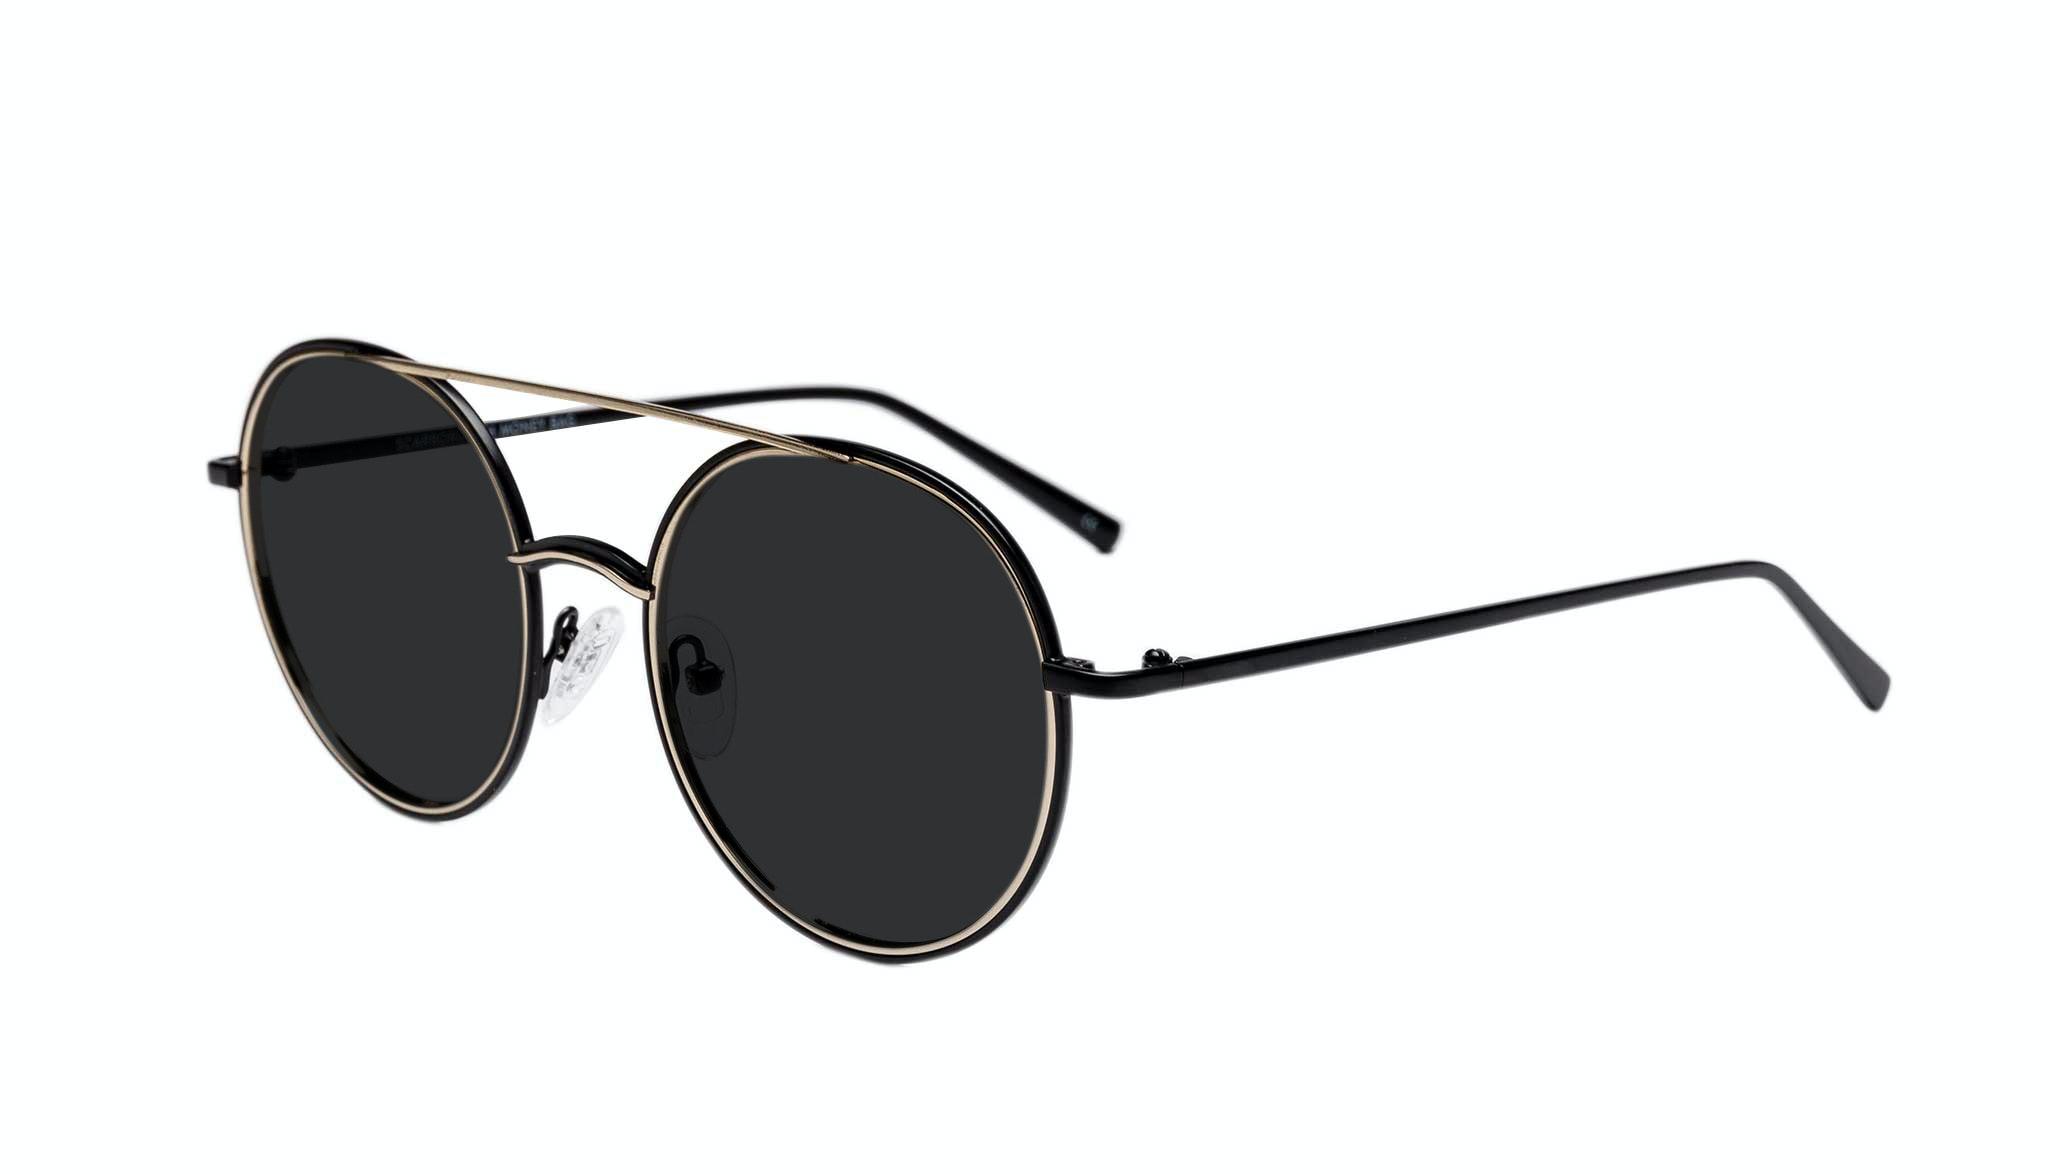 Affordable Fashion Glasses Aviator Sunglasses Women Scarborough Money Bag Tilt